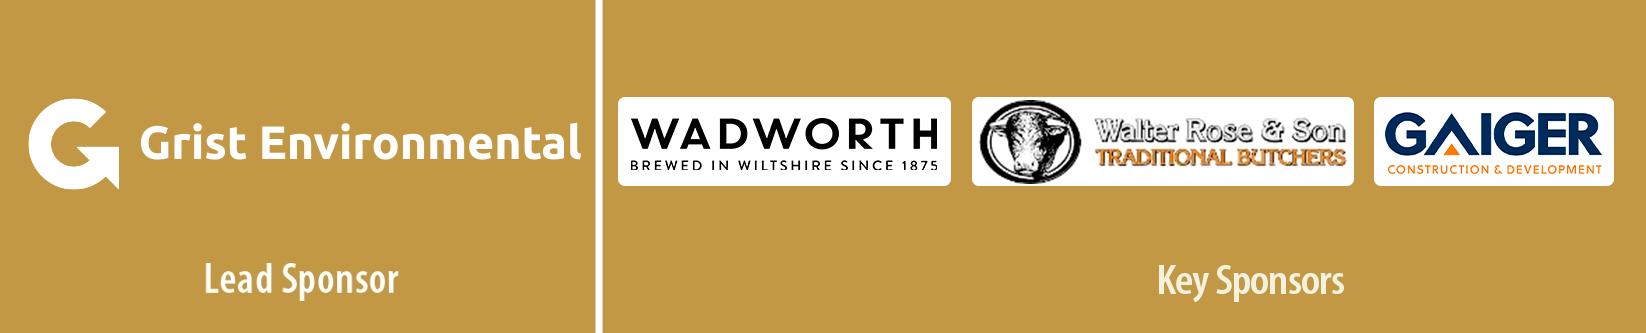 Sponsor logos - Devizes Arts Festival 2021: Grist Environmental, Wadworth Brewery, Walter Rose butchers, Gaiger Construction